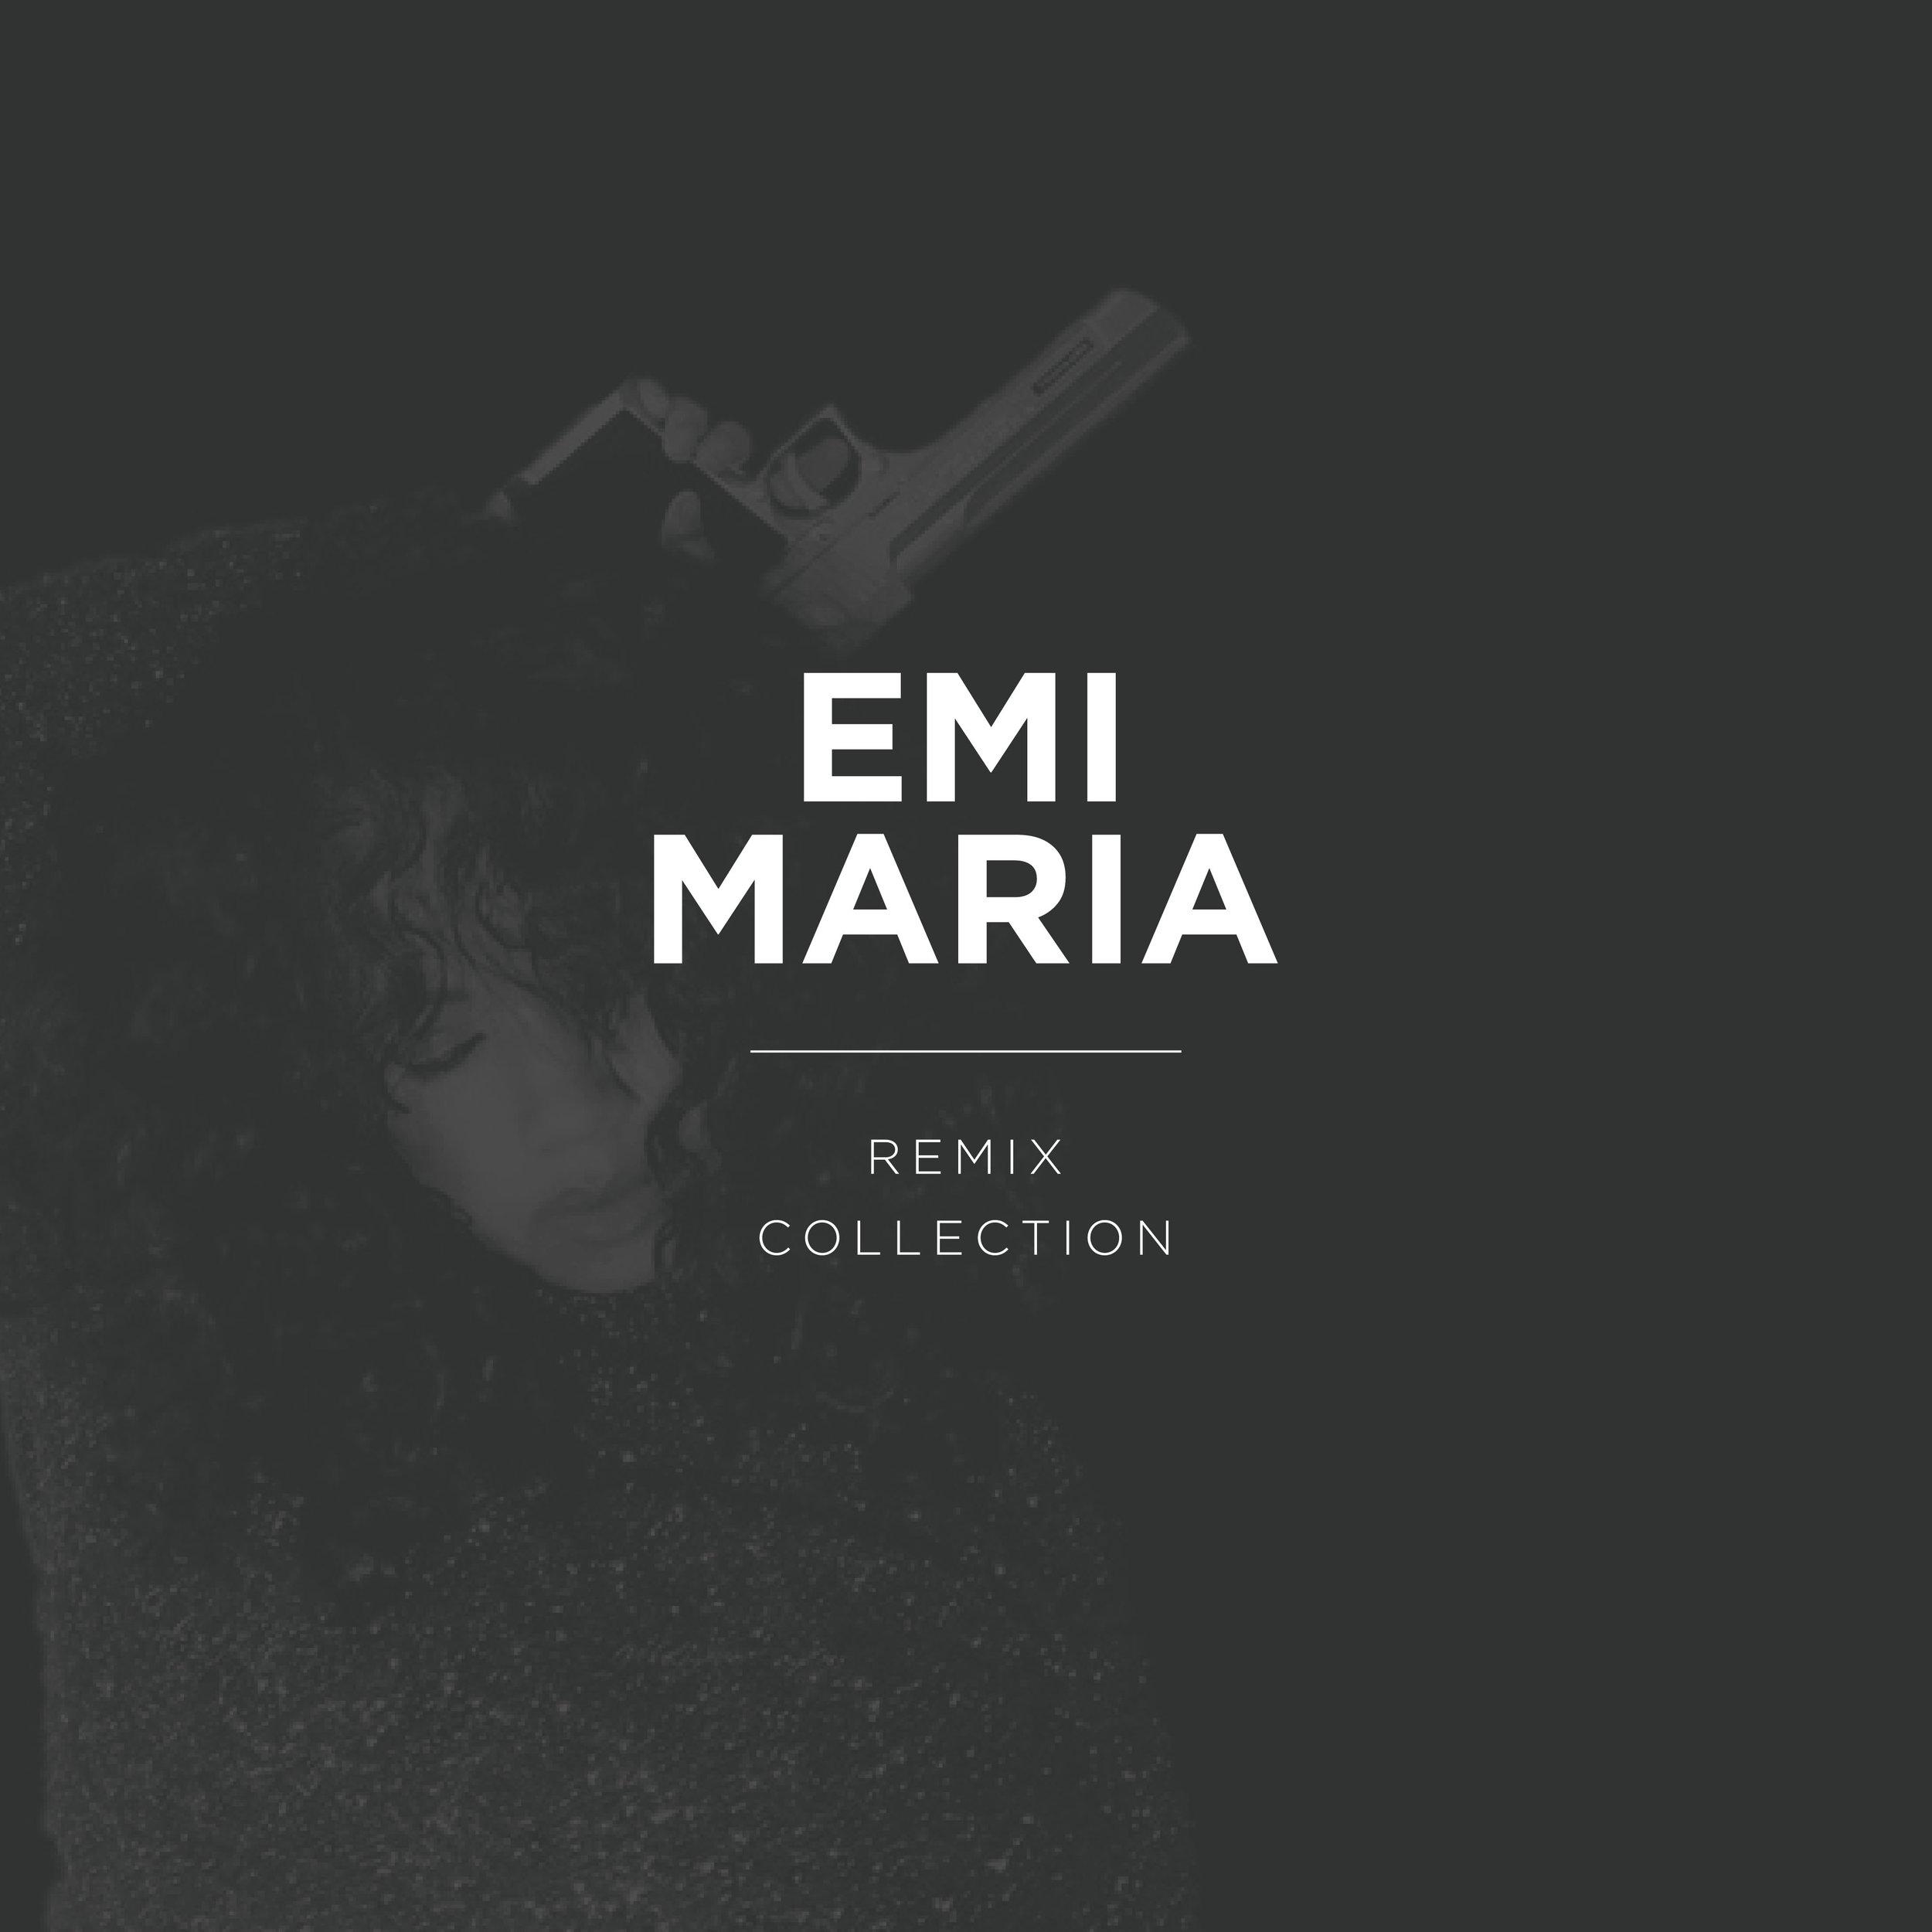 5th Aug 2019  Emi Maria remix collection /  Various Artist